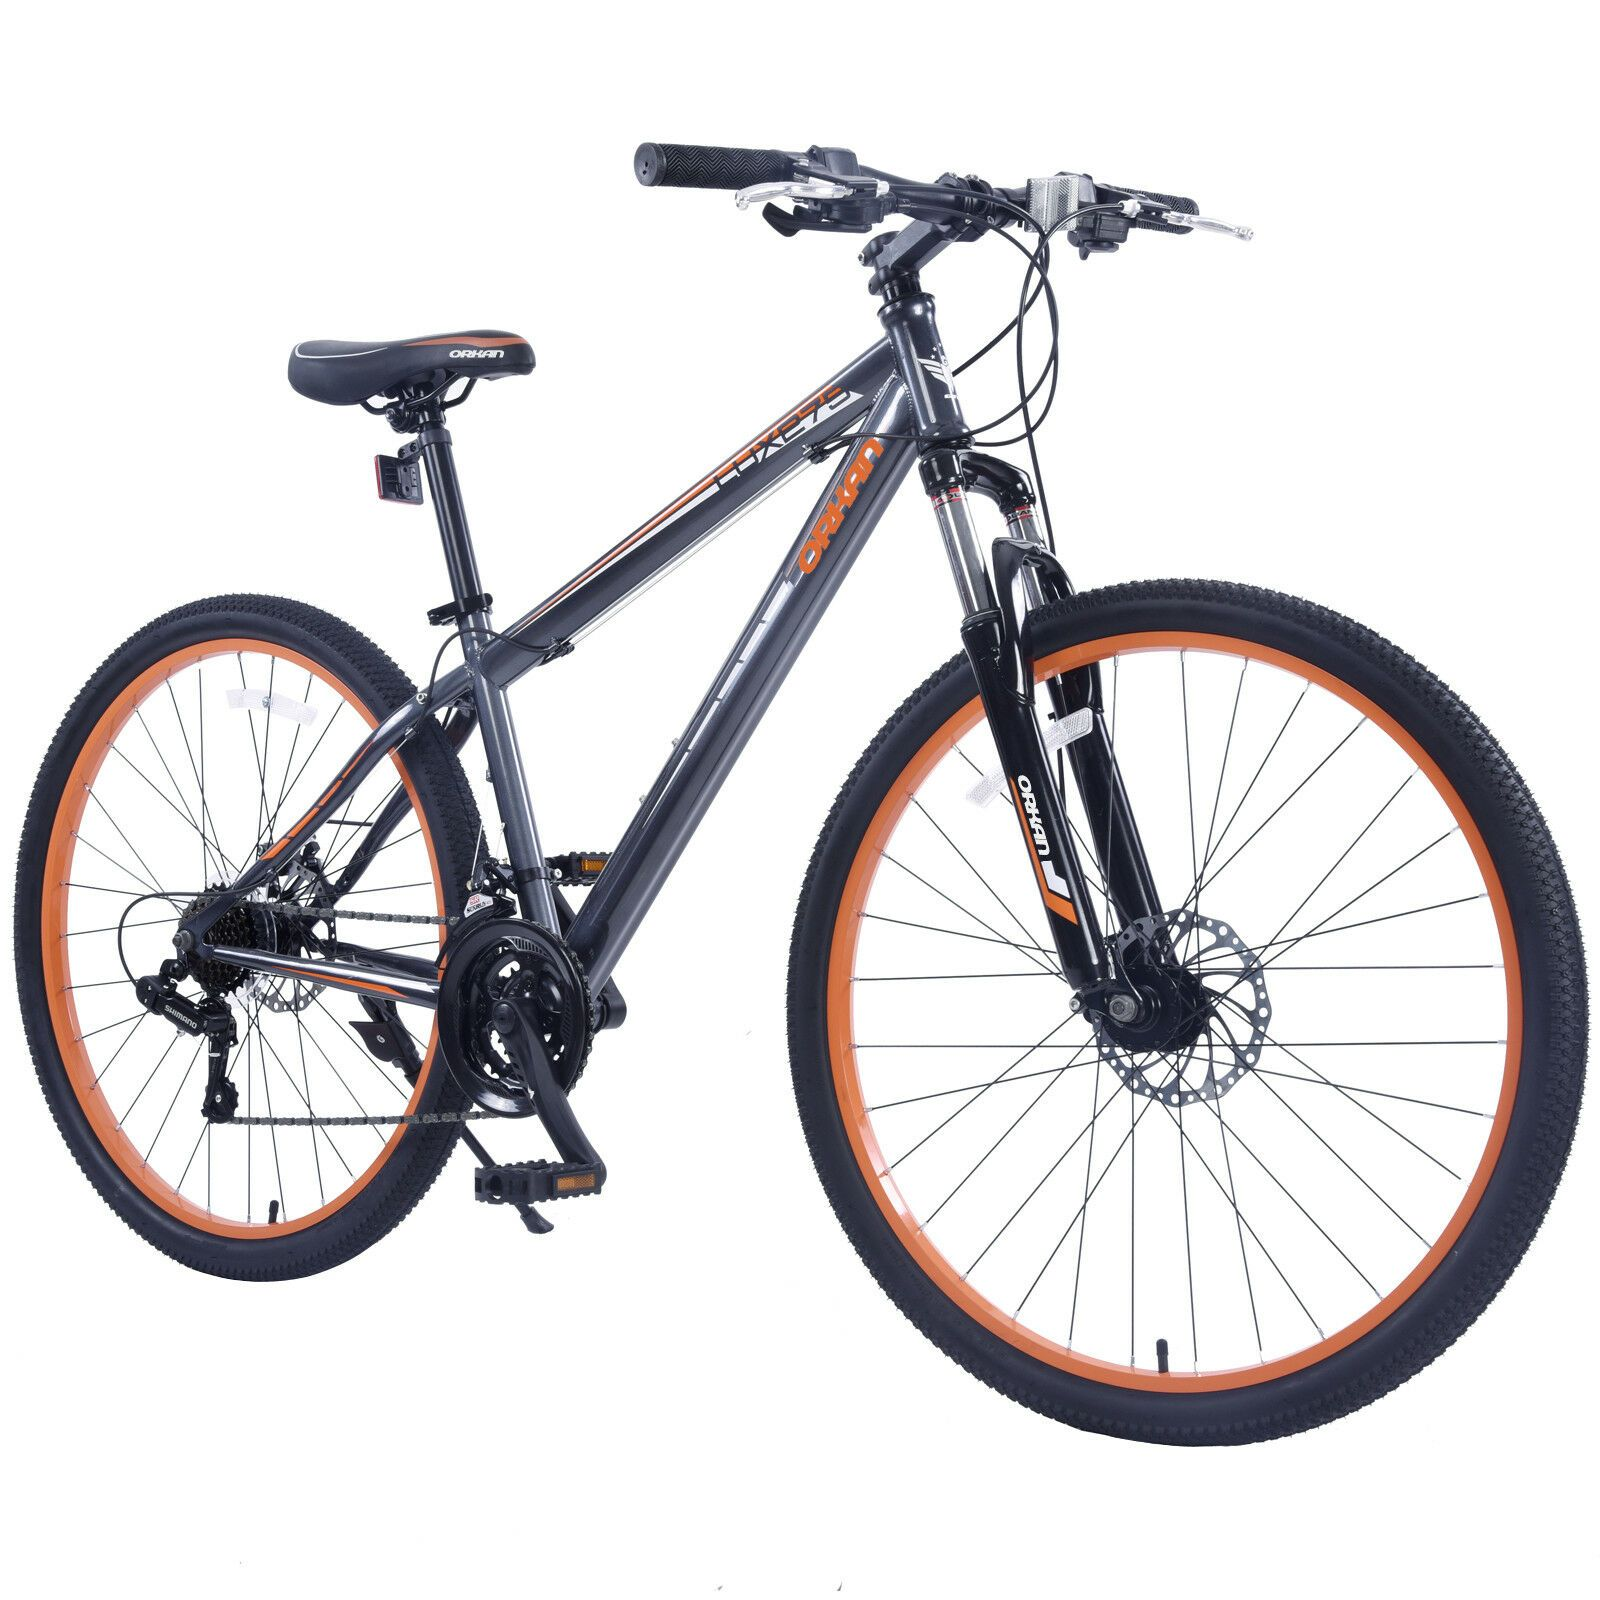 Kenwell 27.5 Mens Mountain Bike Shimano Hybrid 21 Speed